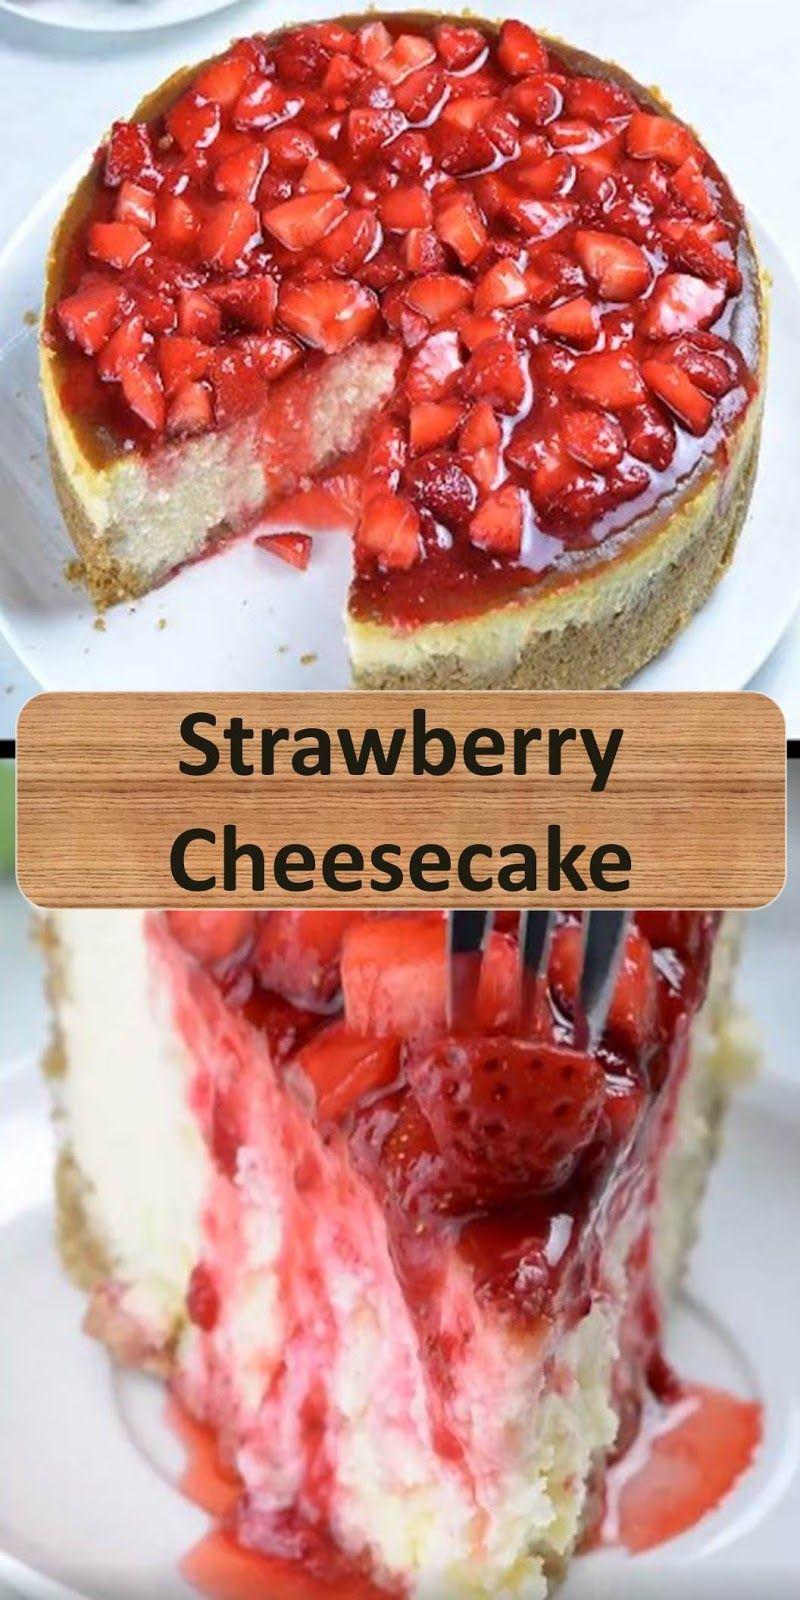 Strawberry Cheesecake in 2020 Strawberry recipes